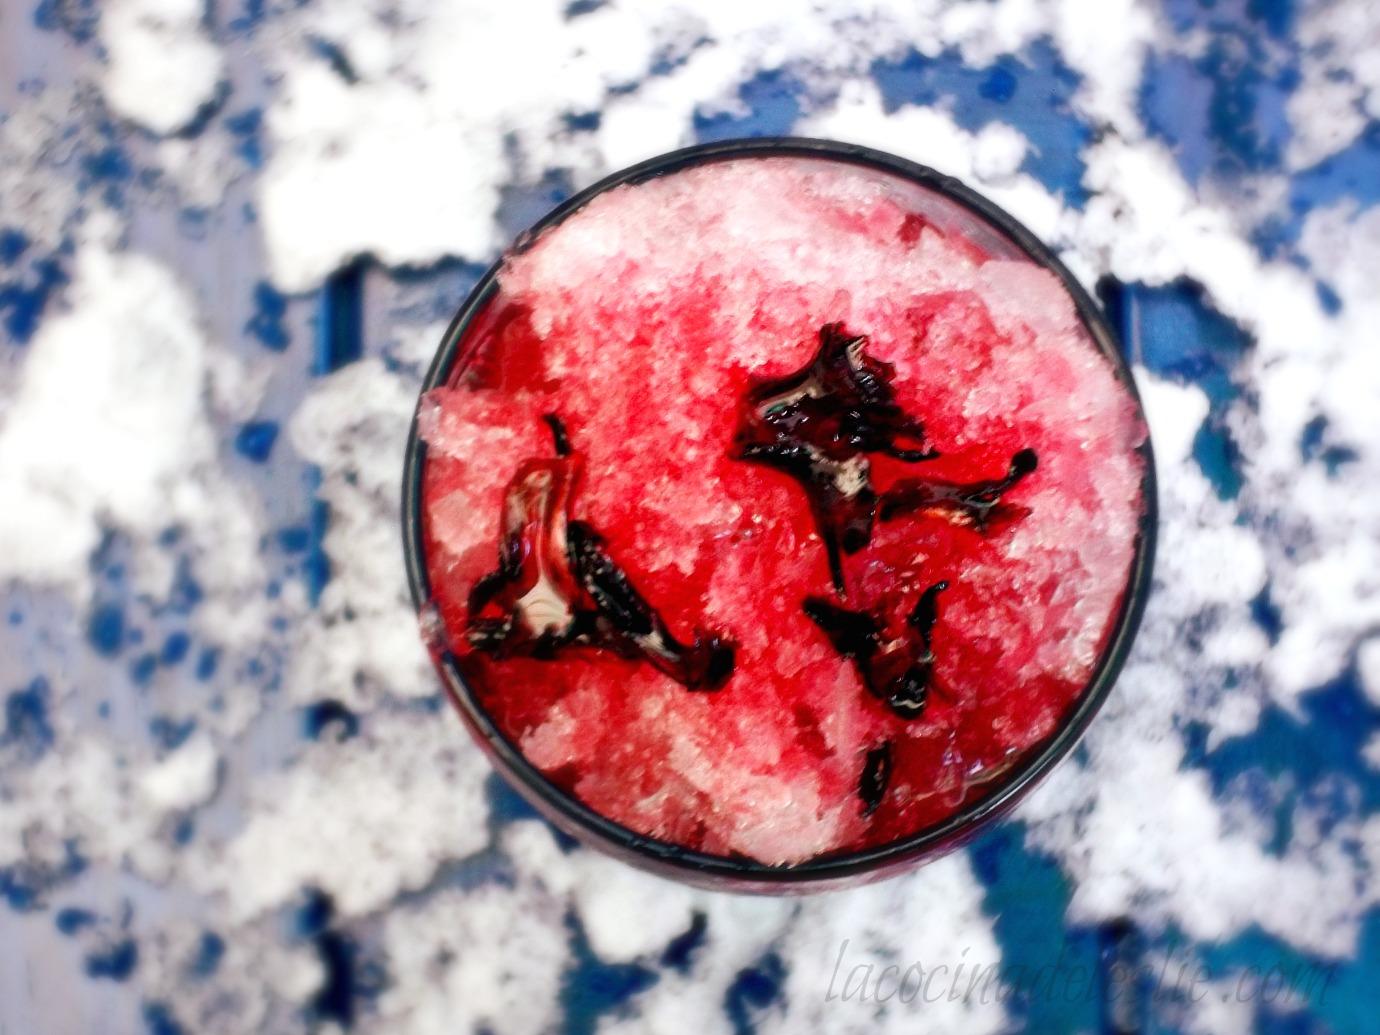 Almbar de jamaica hibiscus flower syrup for raspados she made almbar de jamaica hibiscus flower syrup for raspados she madeella hace izmirmasajfo Choice Image